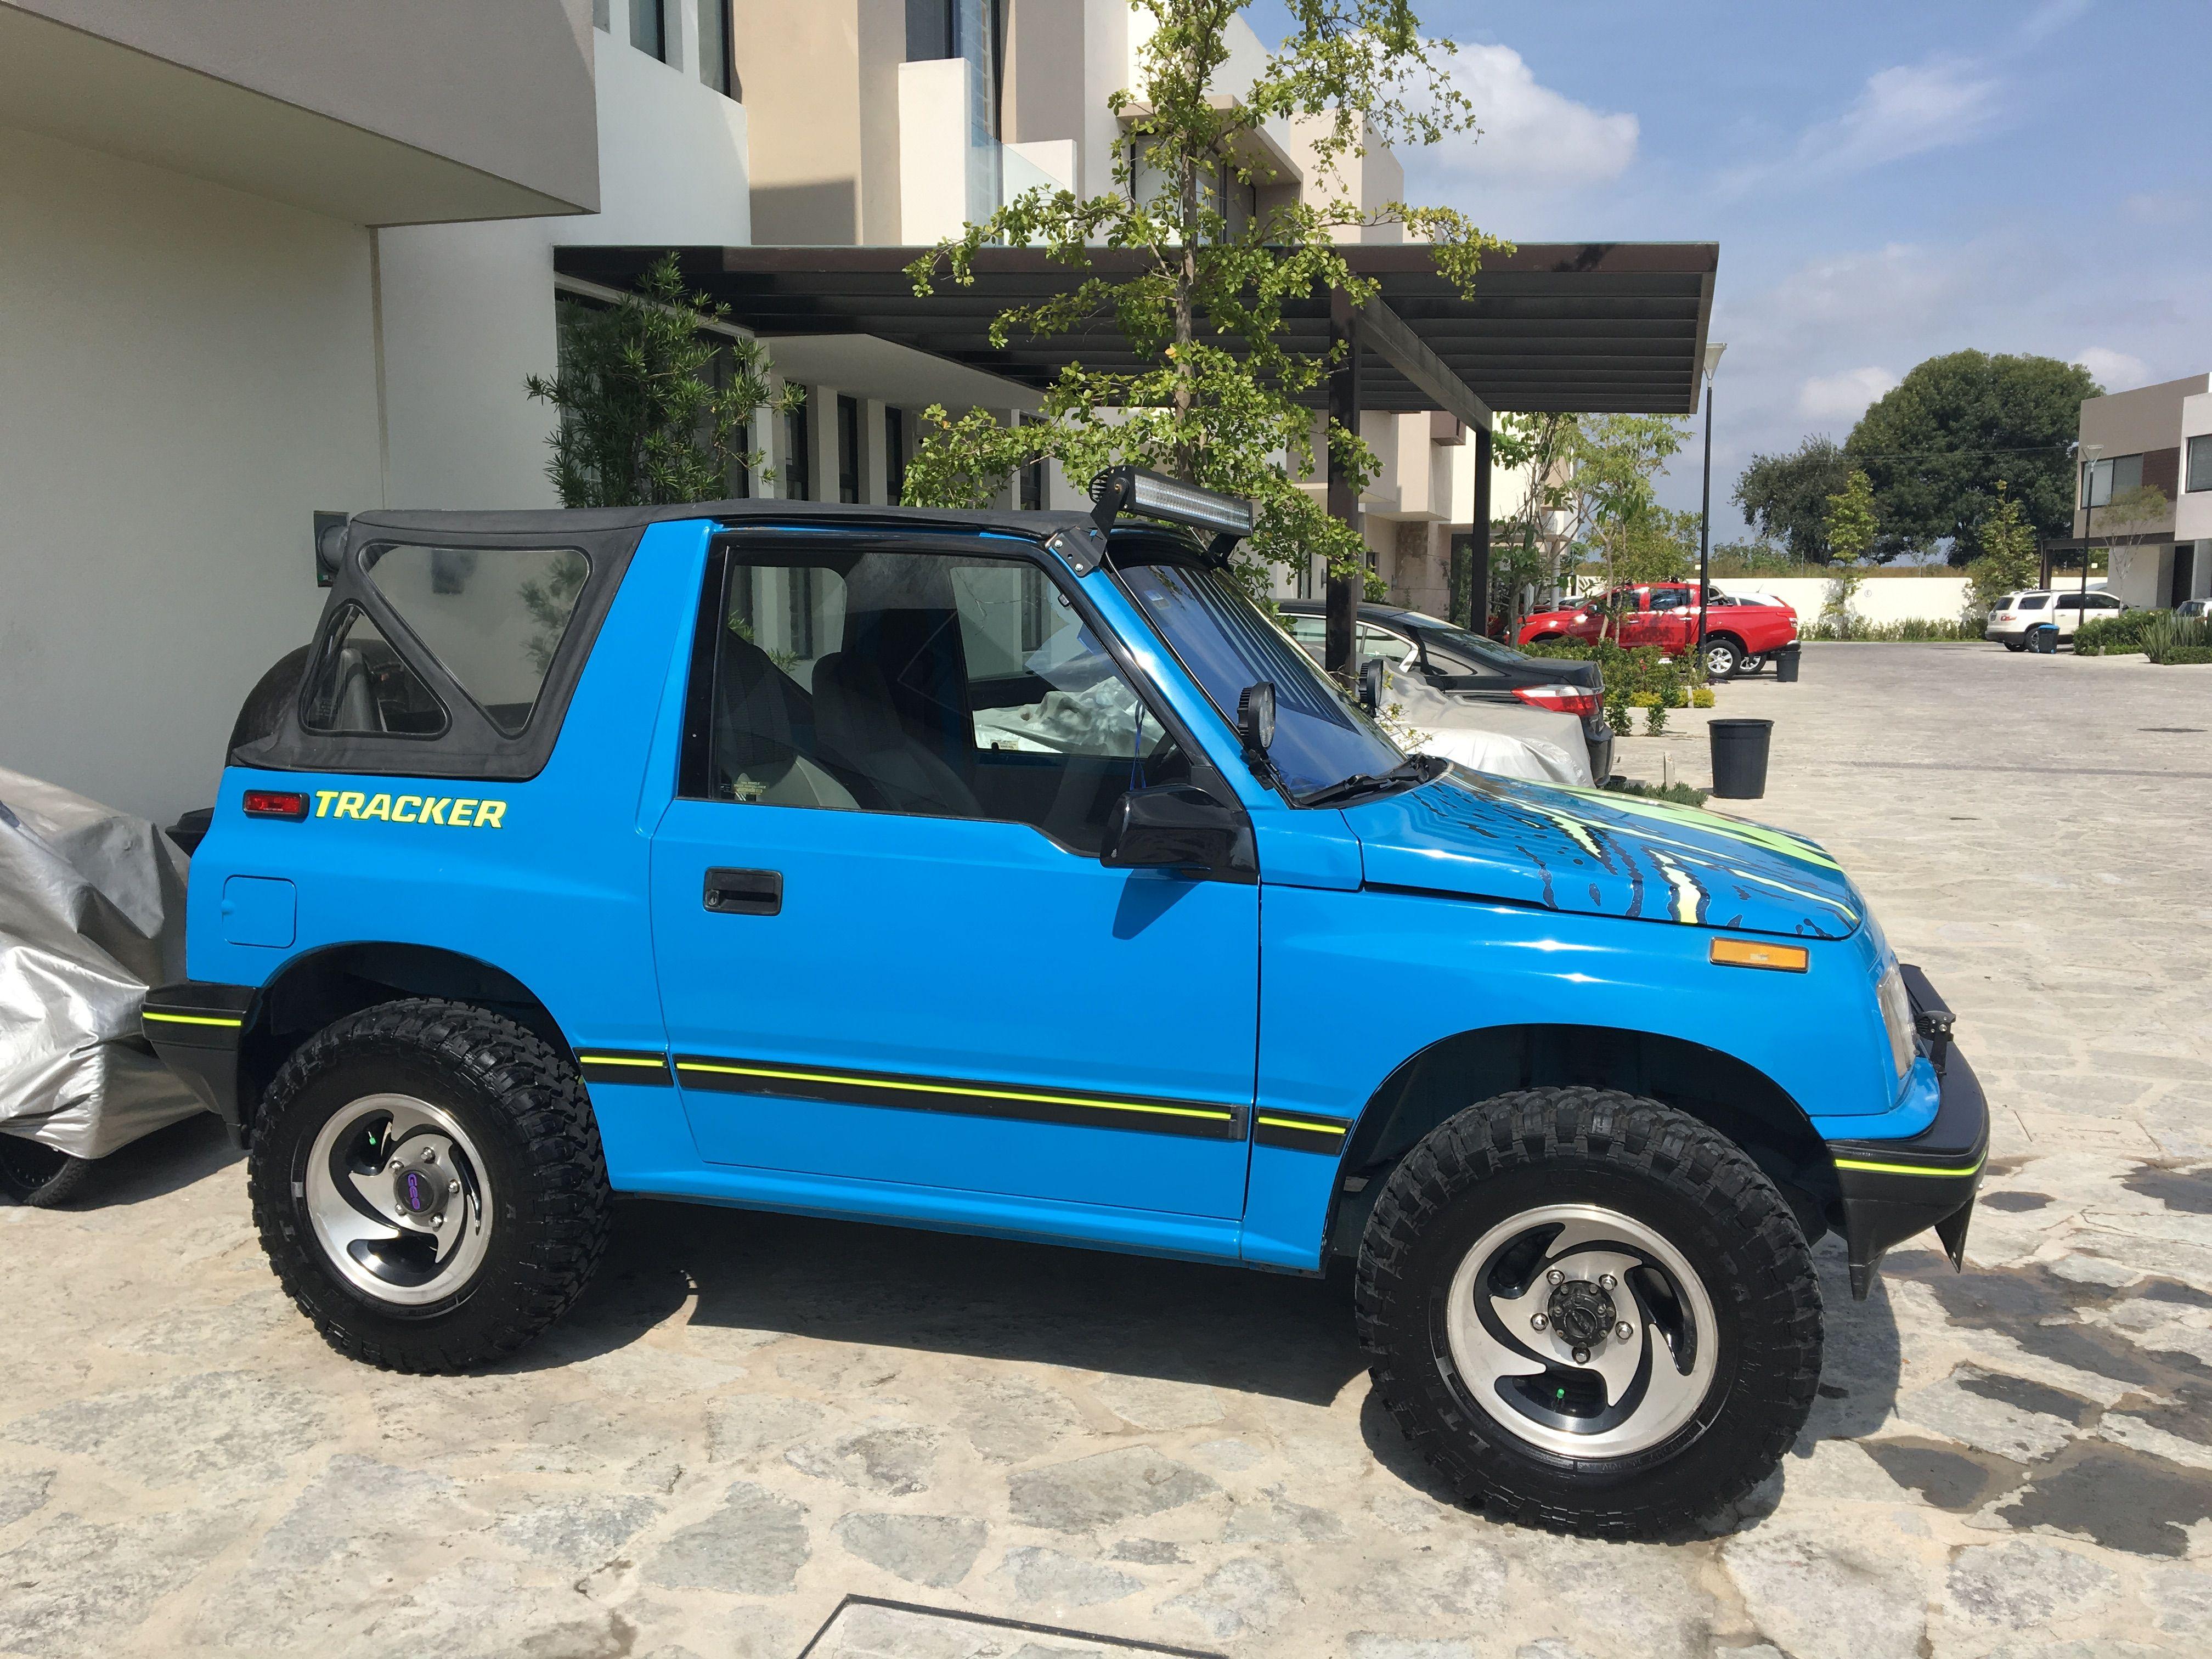 Geo Tracker Suzuki Vitara 4x4 Suv 4x4 Cute Cars